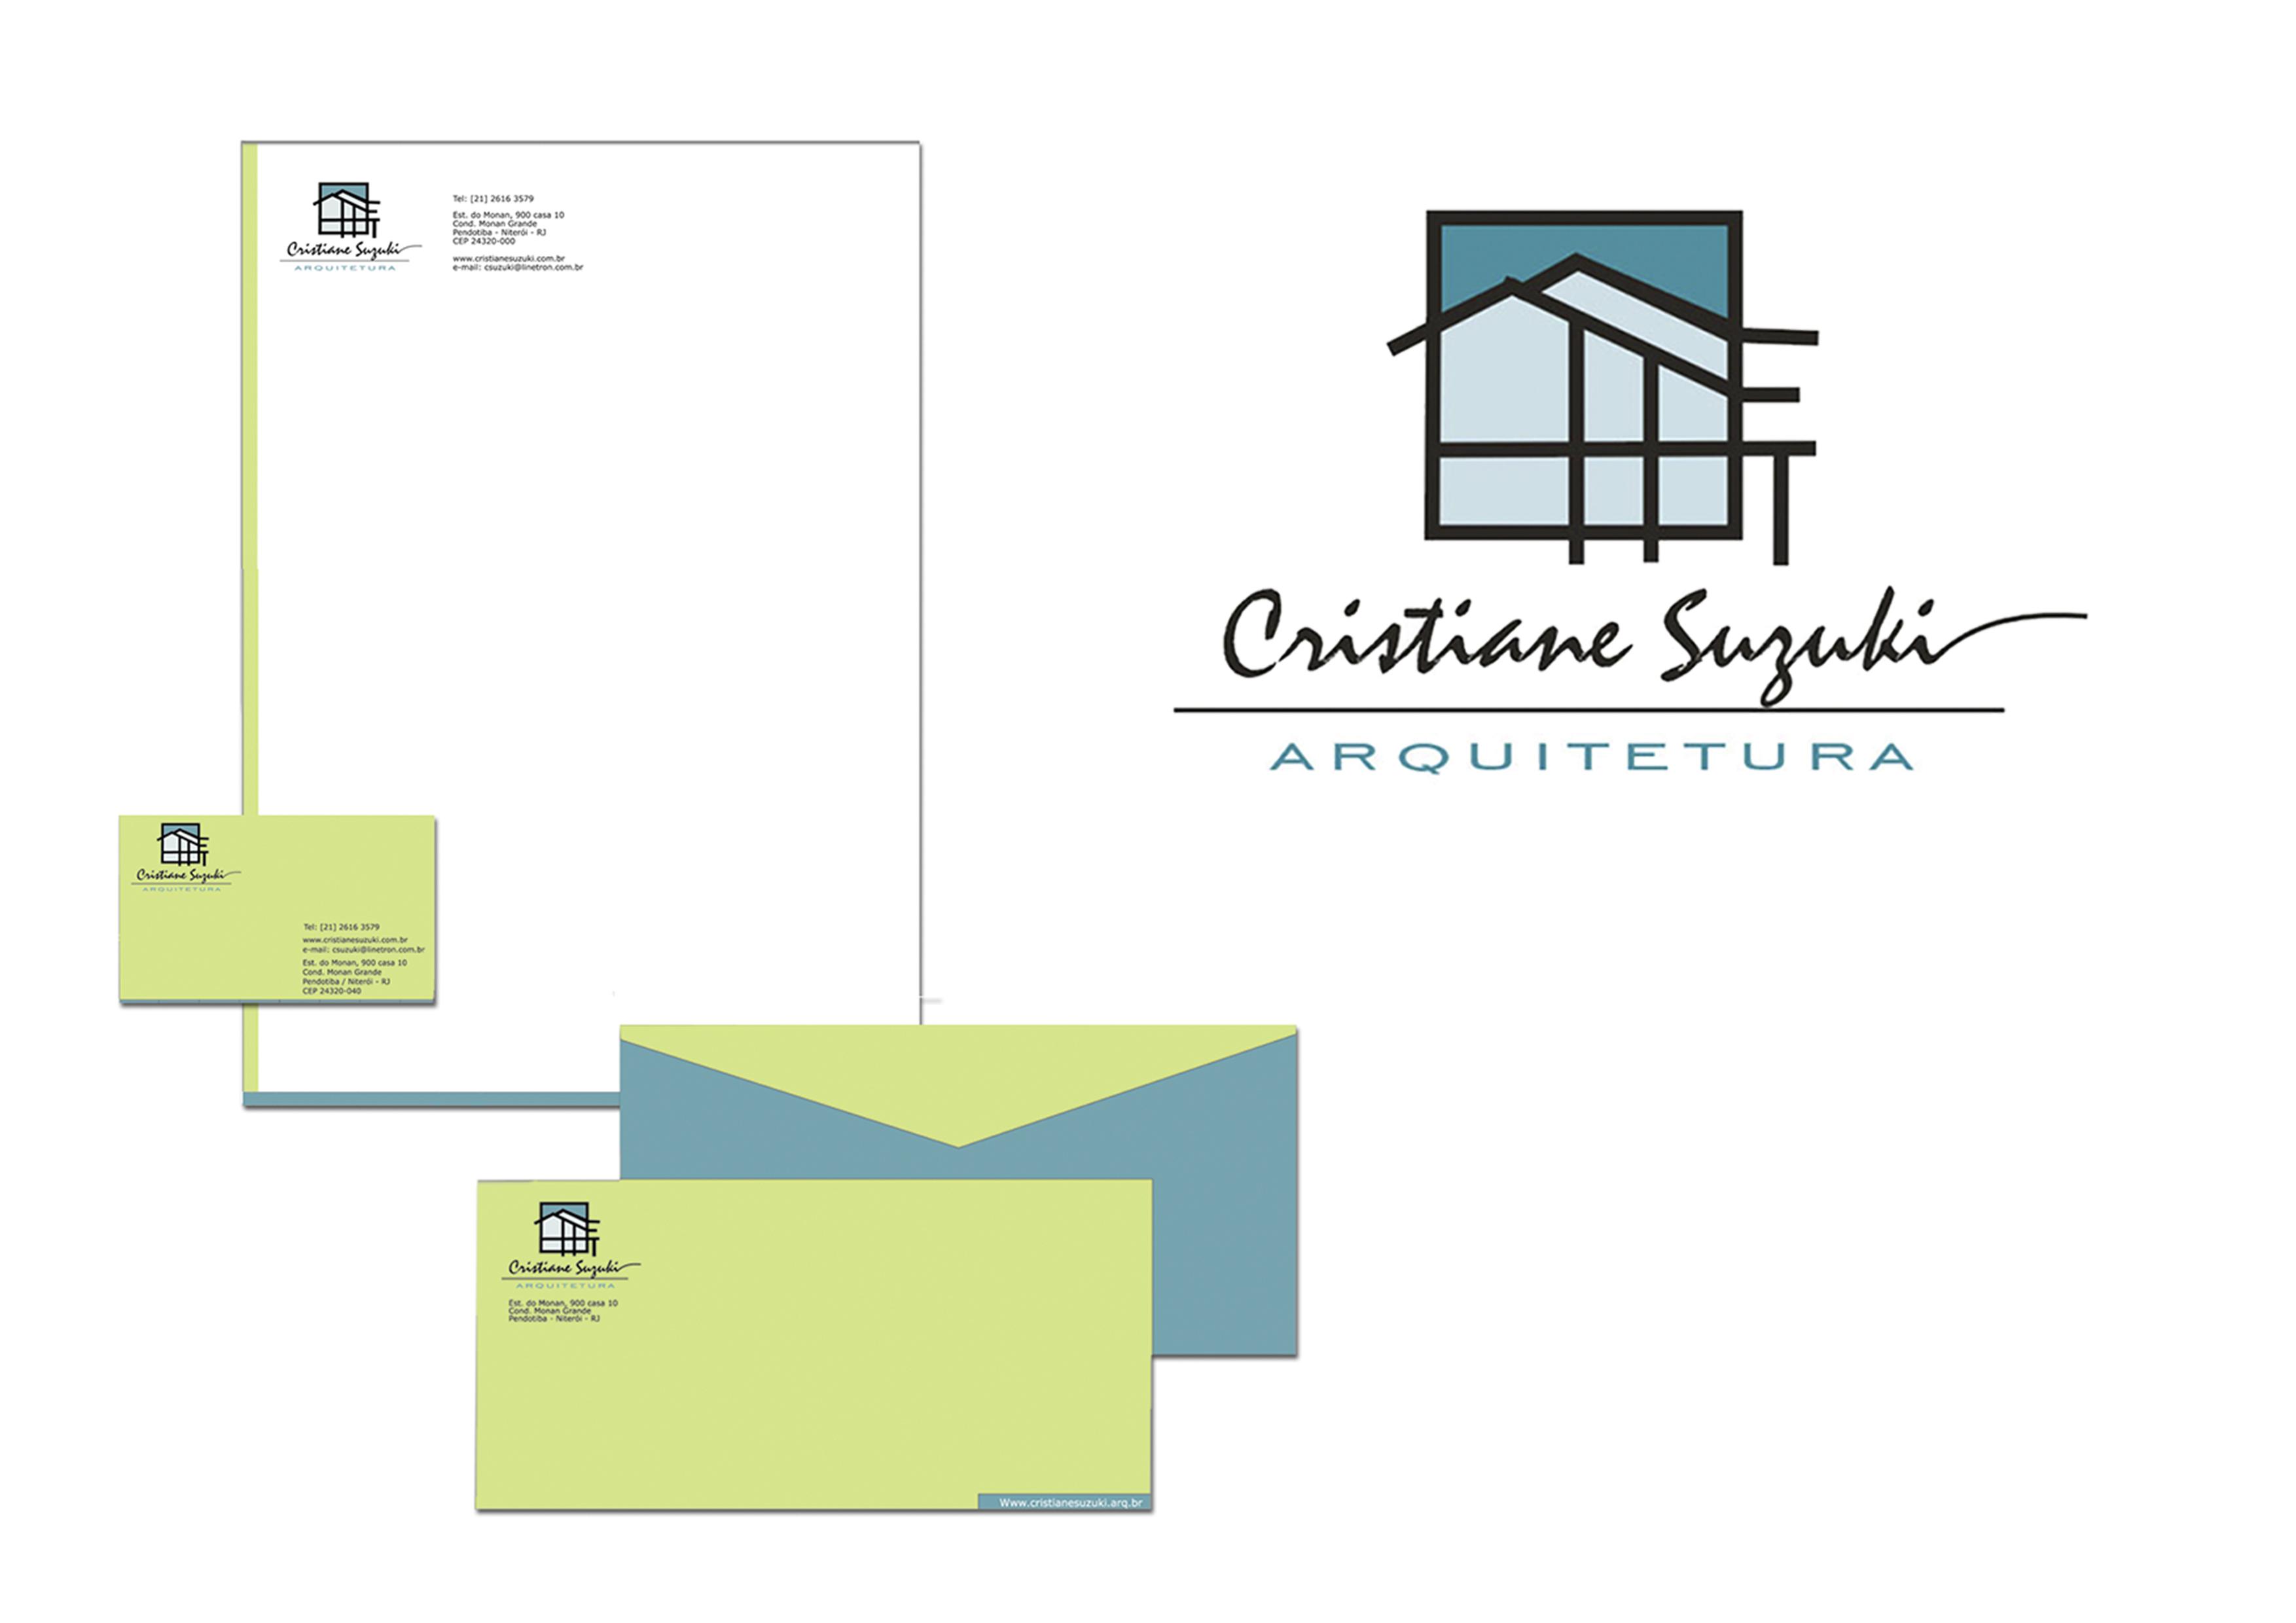 Cristiane Suzuki - Arquiteta